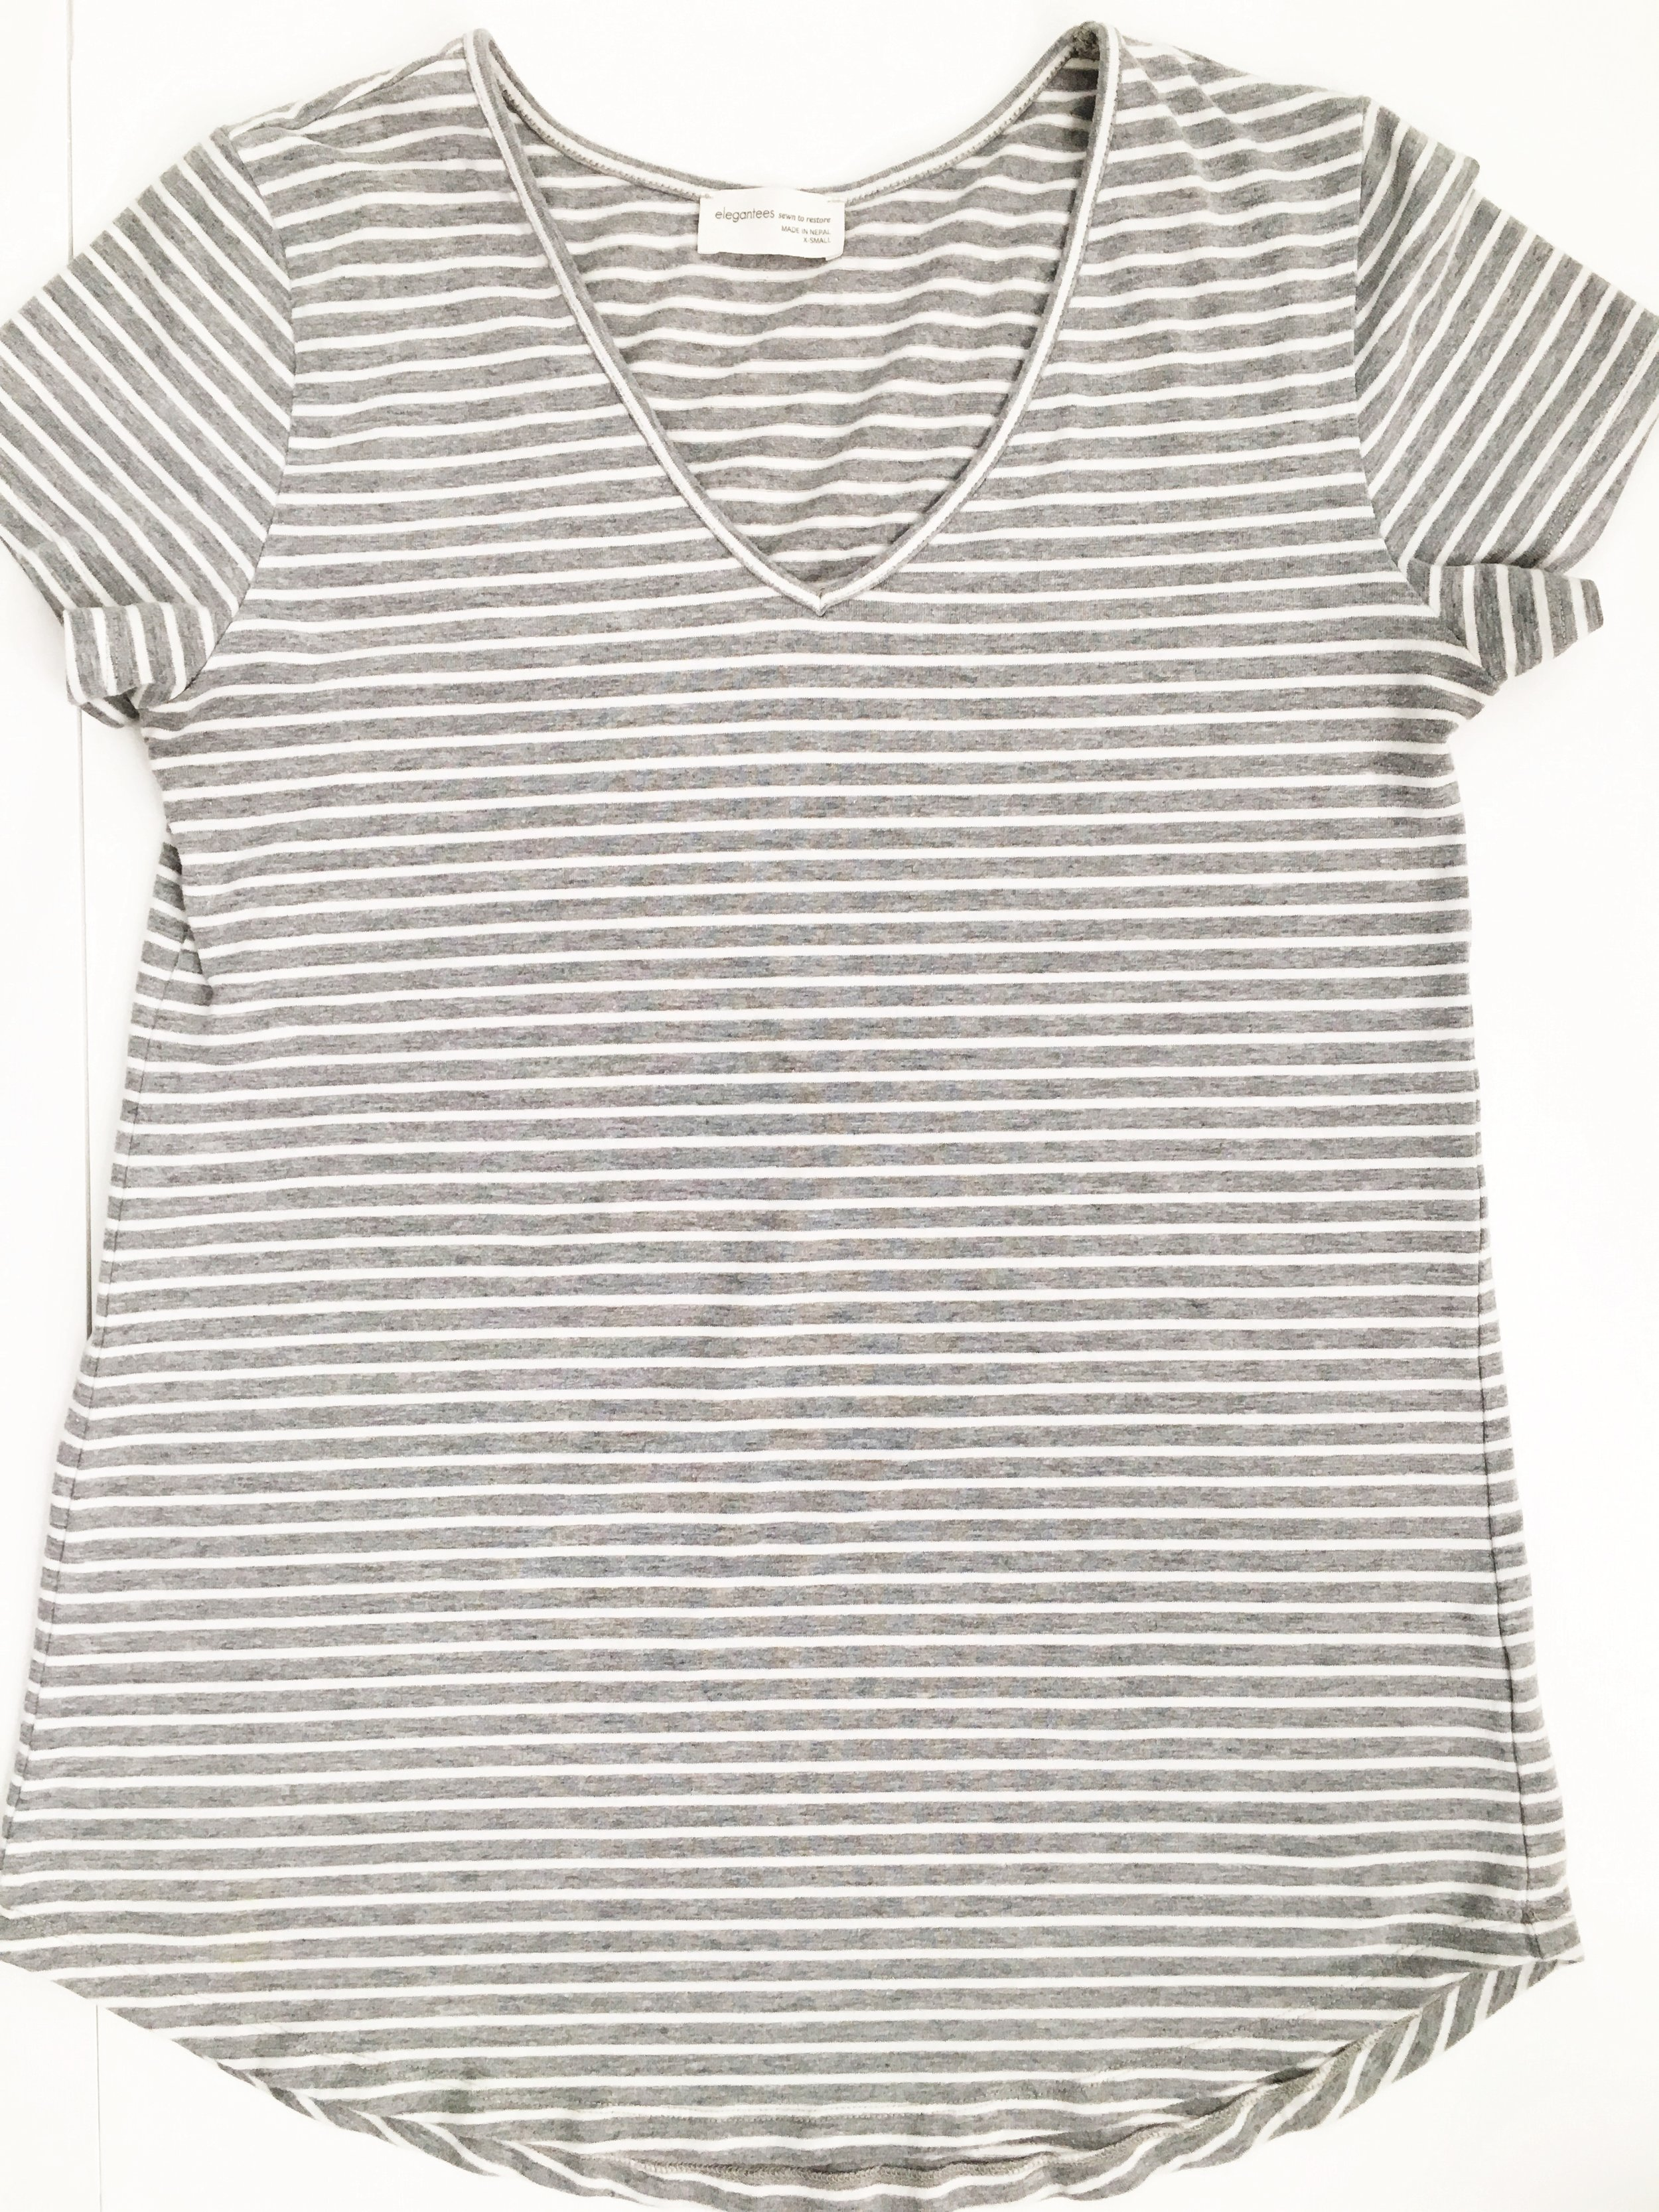 Spring fashion style: 10x10 challenge (ethical brand Elegantees)